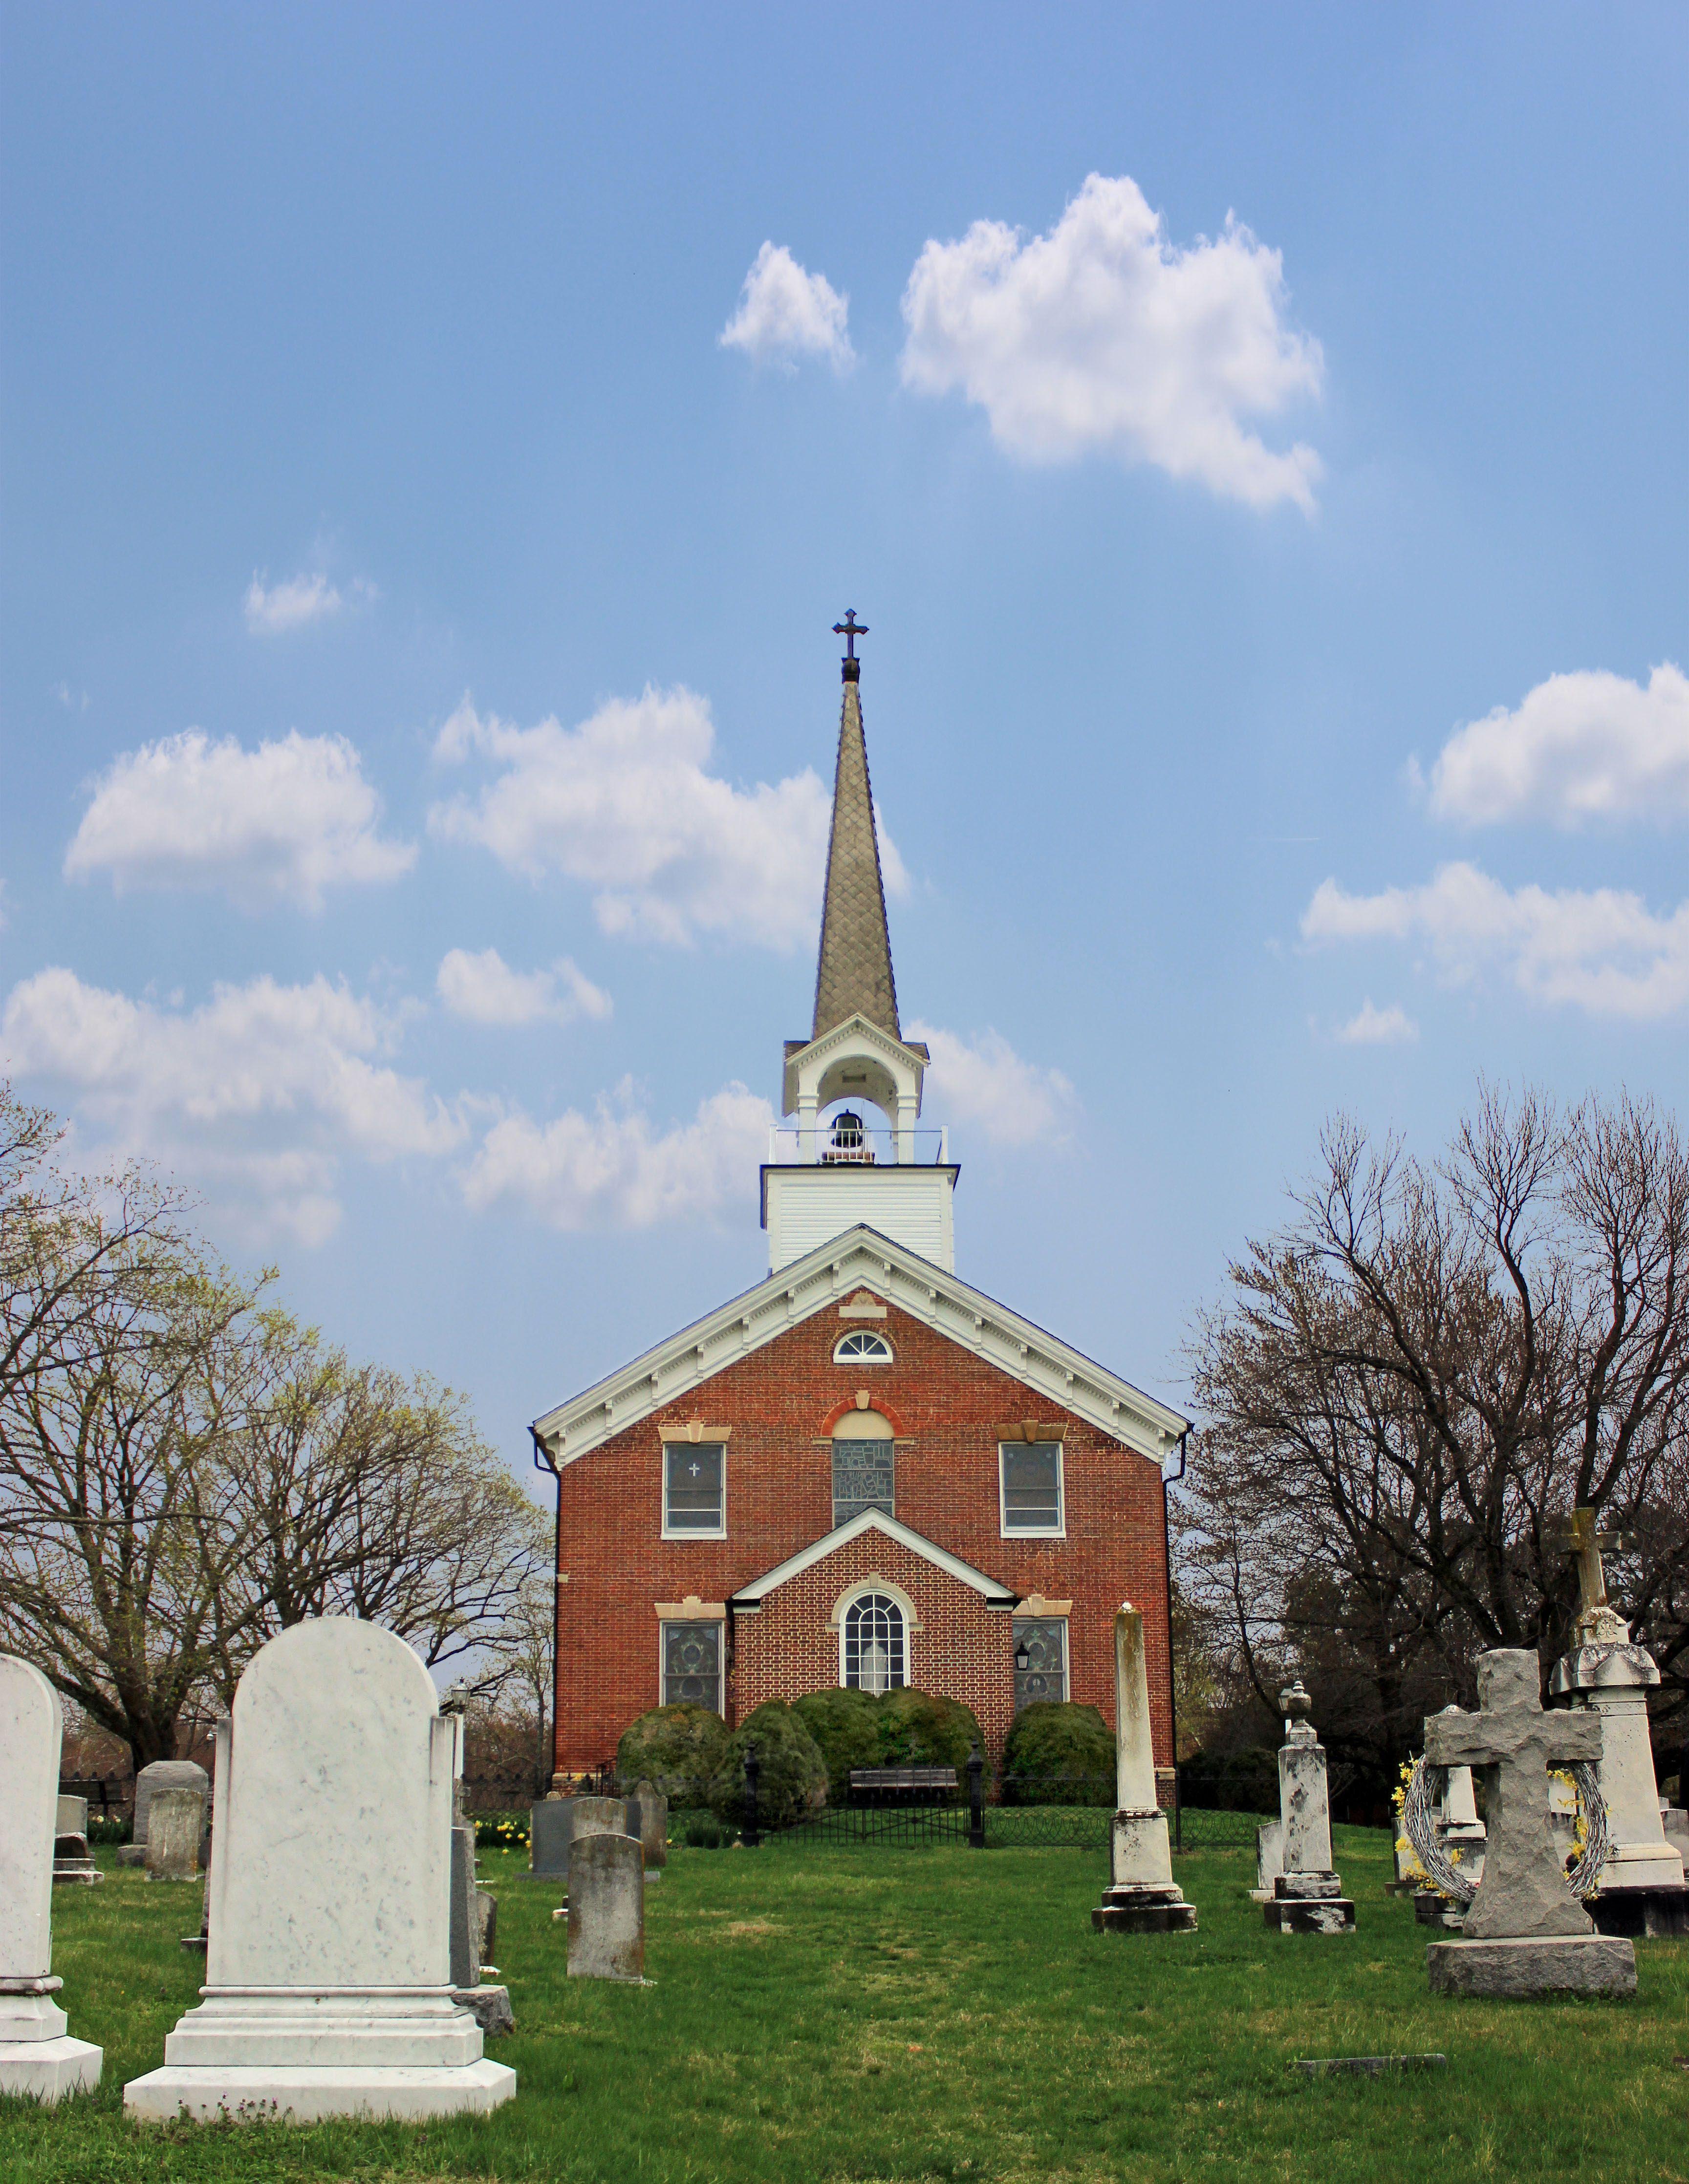 St. Ignatius Catholic Church, Port Tobacco, Charles County, Maryland. Build 1798.